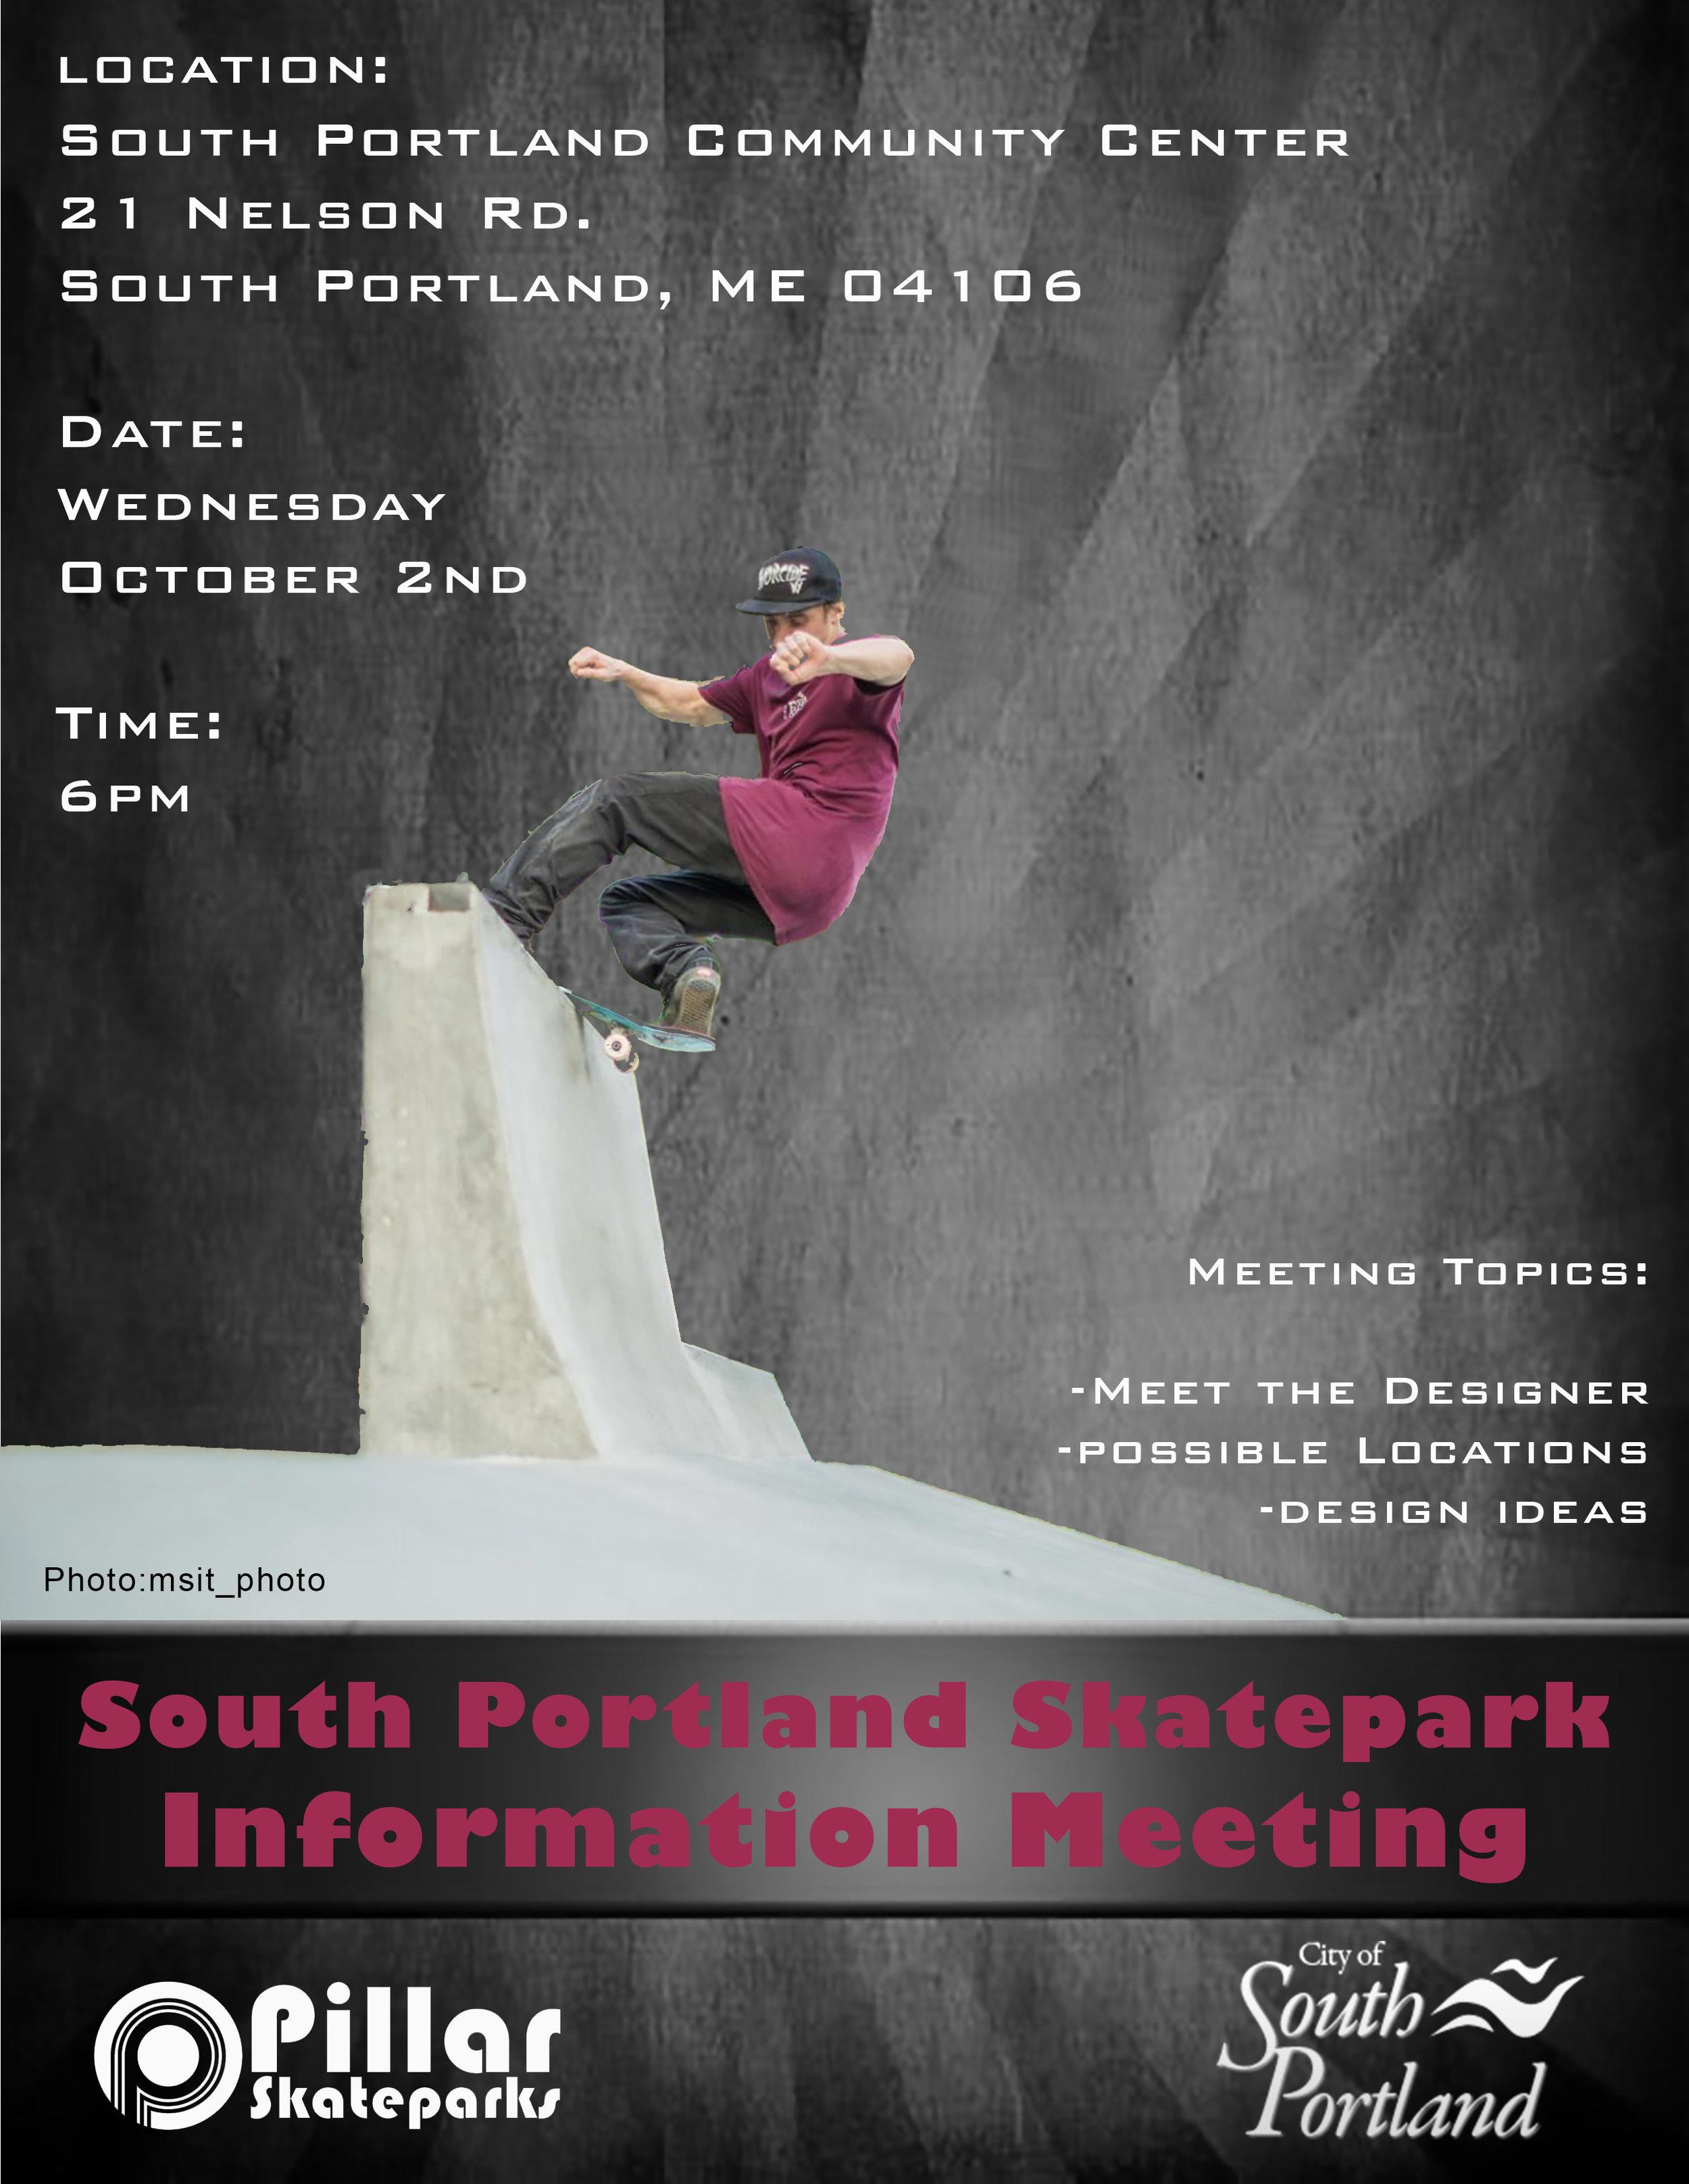 S Portland Meeting #1 Flyer.jpg